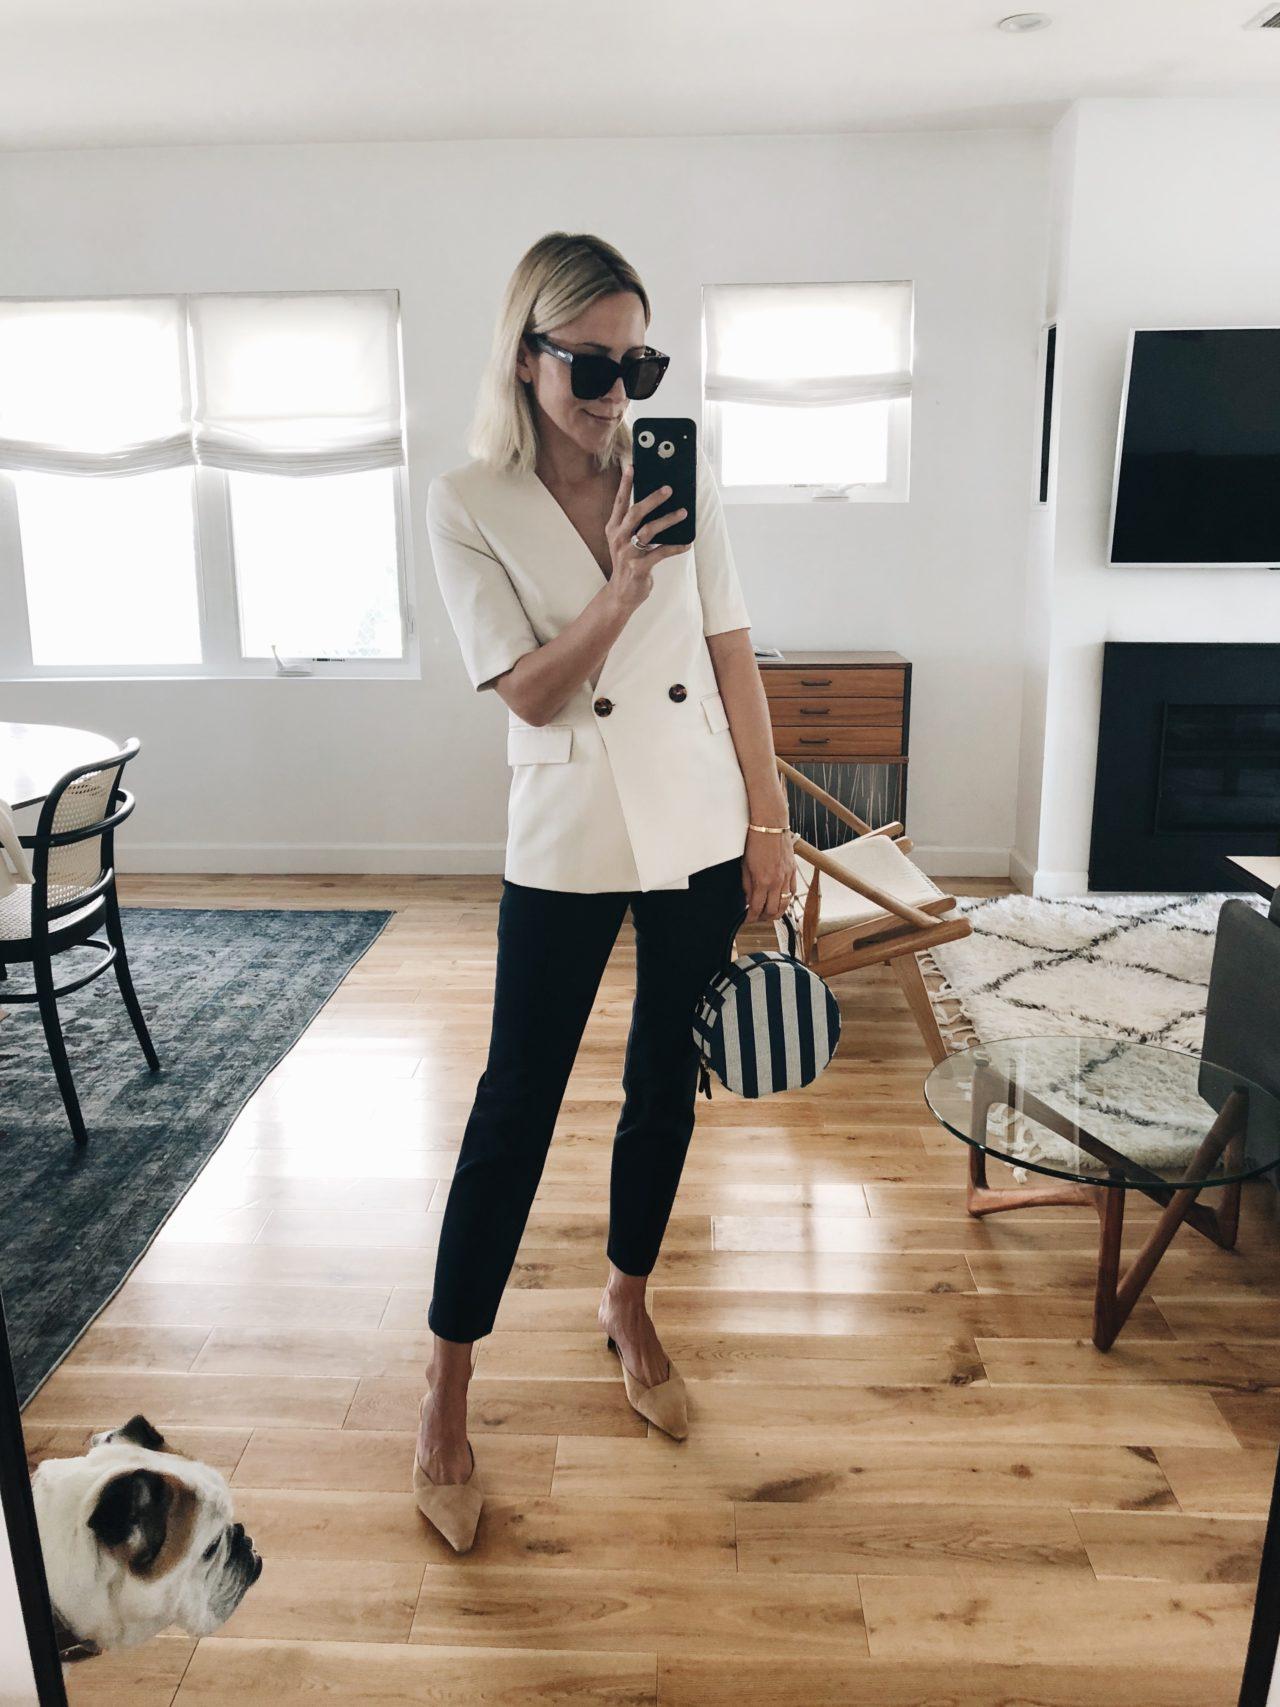 blogger Damselindior mặc áo blazer tay ngắn